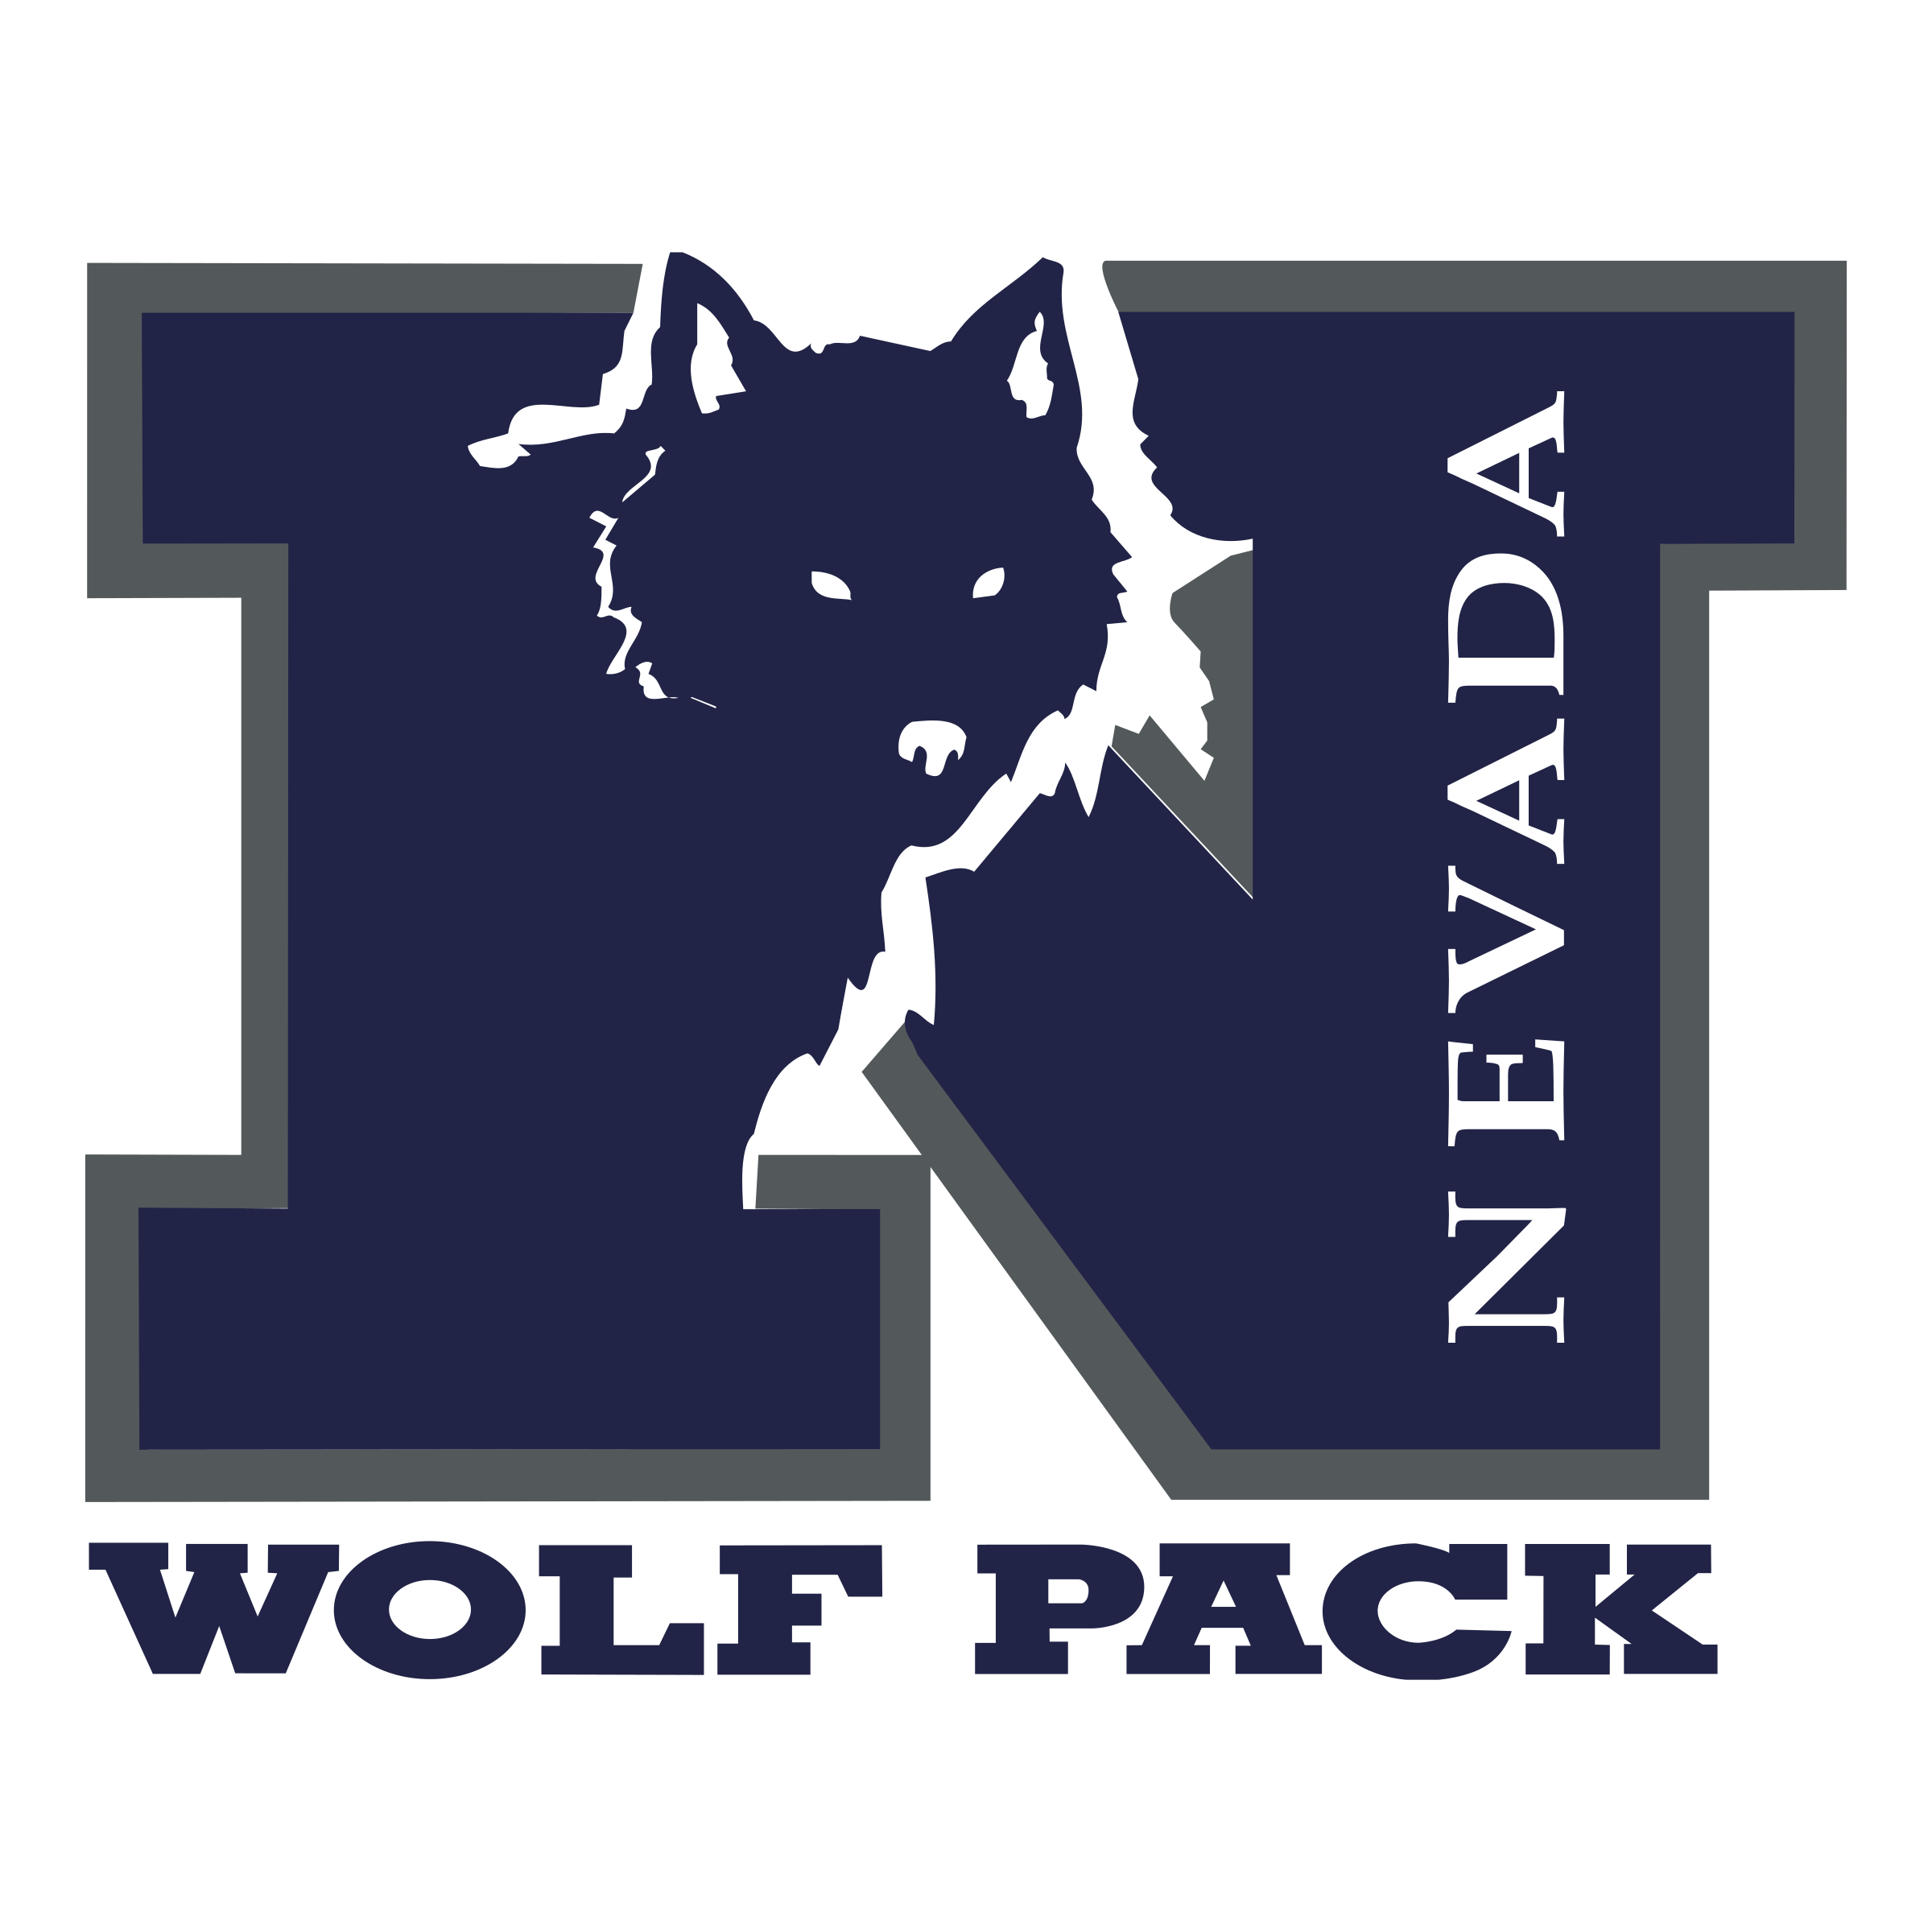 Nevada Wolf Pack Logo PNG Transparent & SVG Vector - Freebie